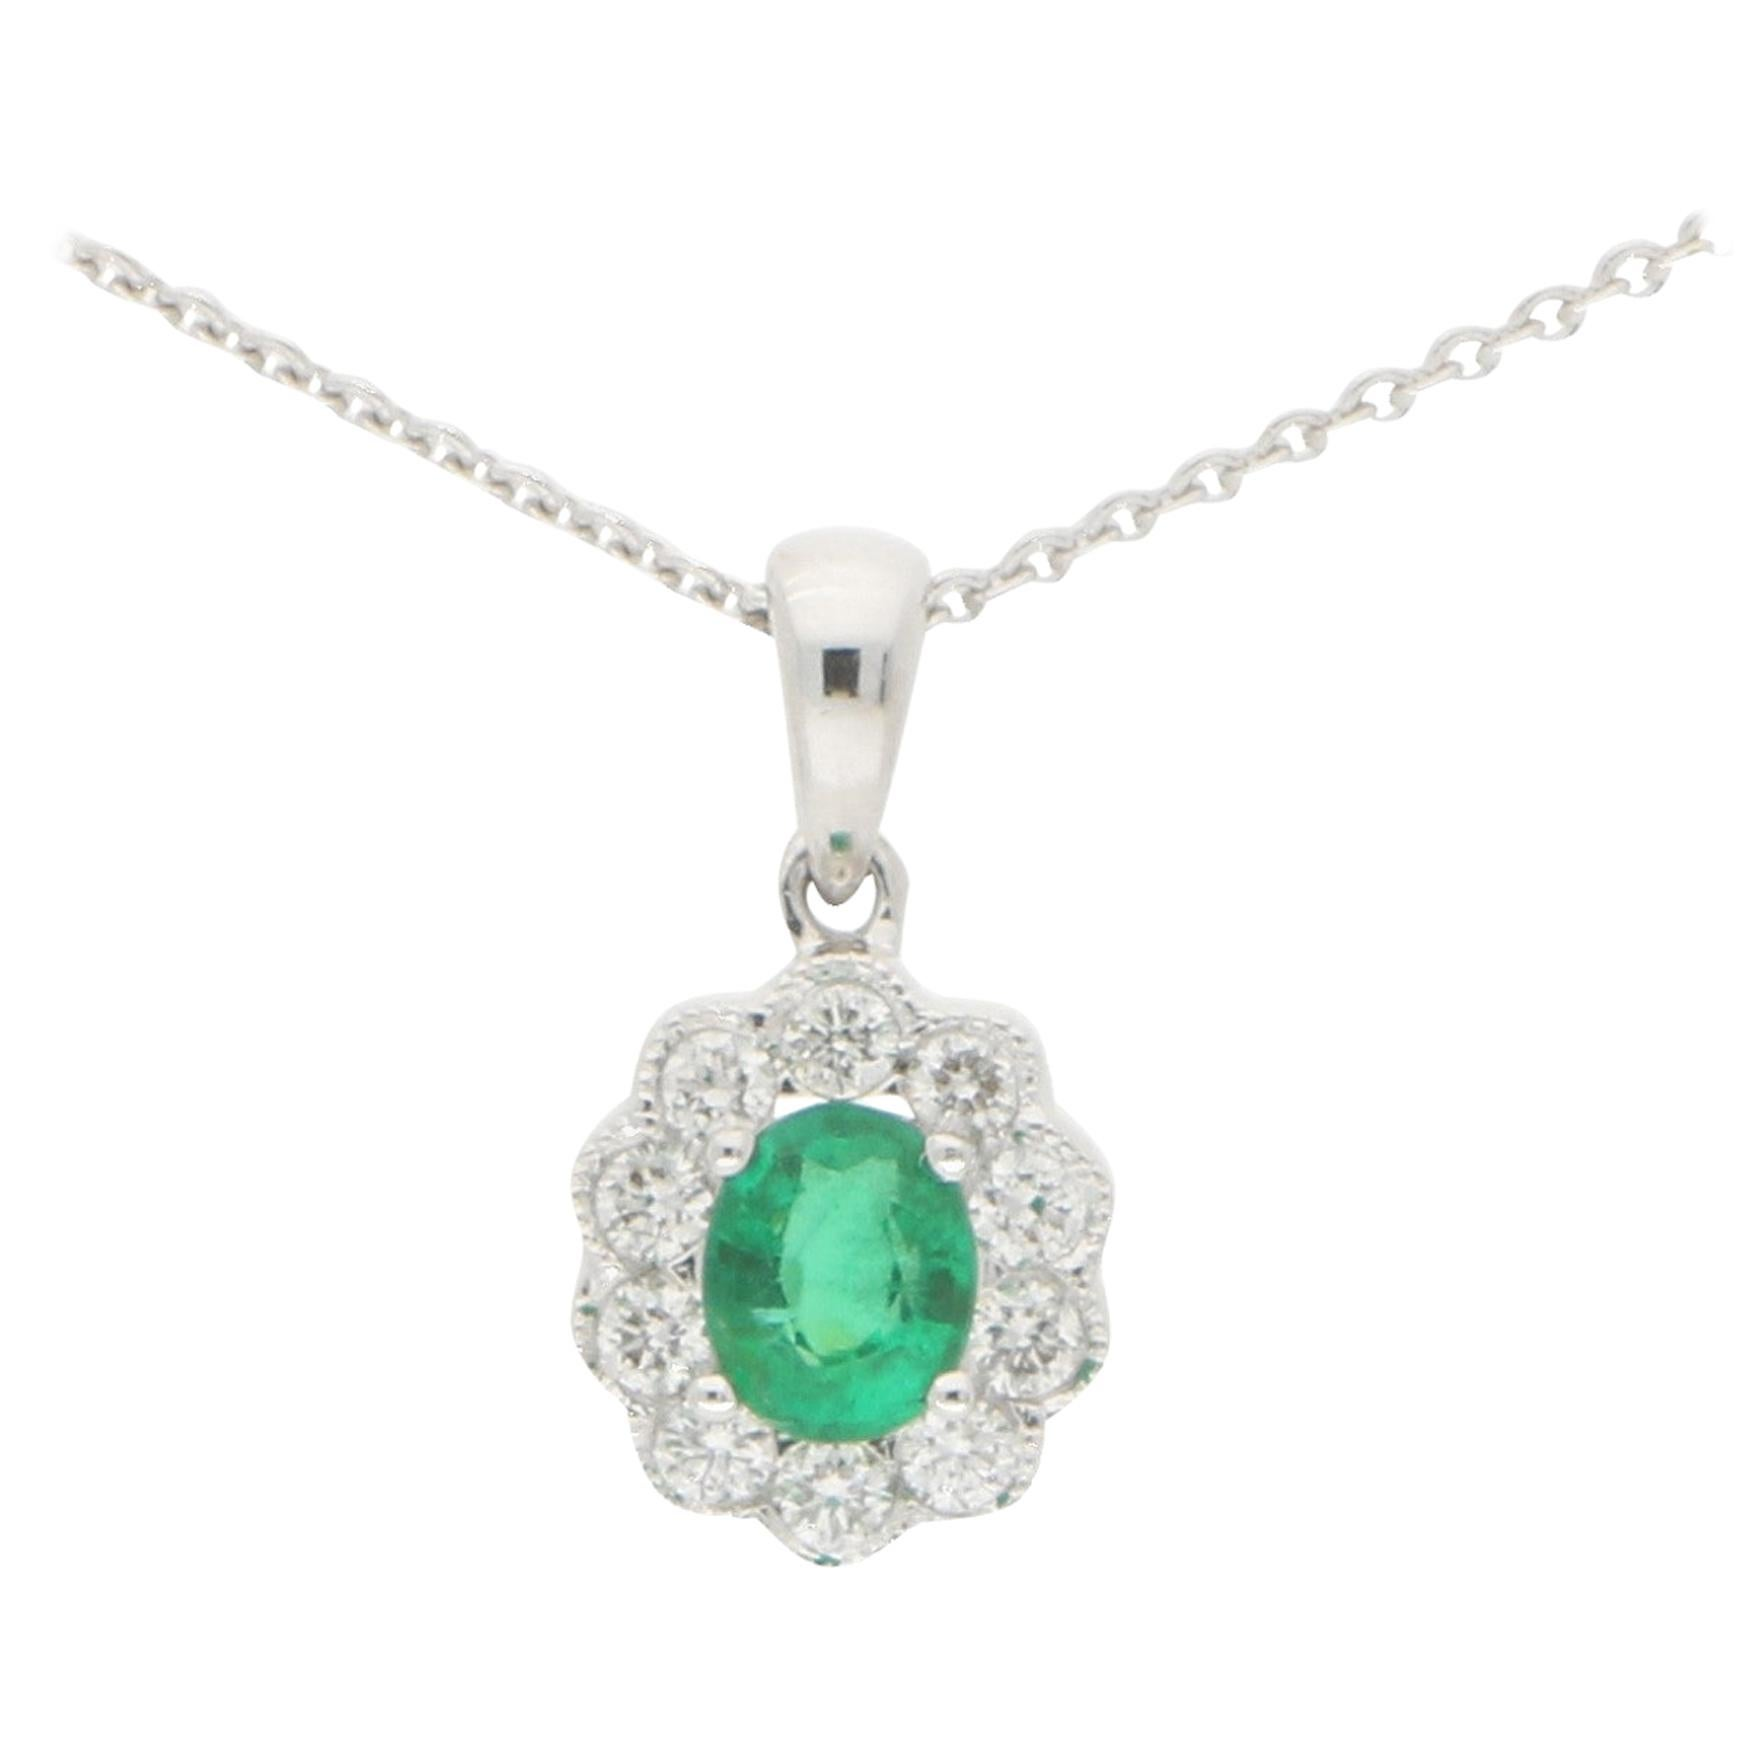 Emerald and Diamond Cluster Pendant Set in 18 Karat White Gold